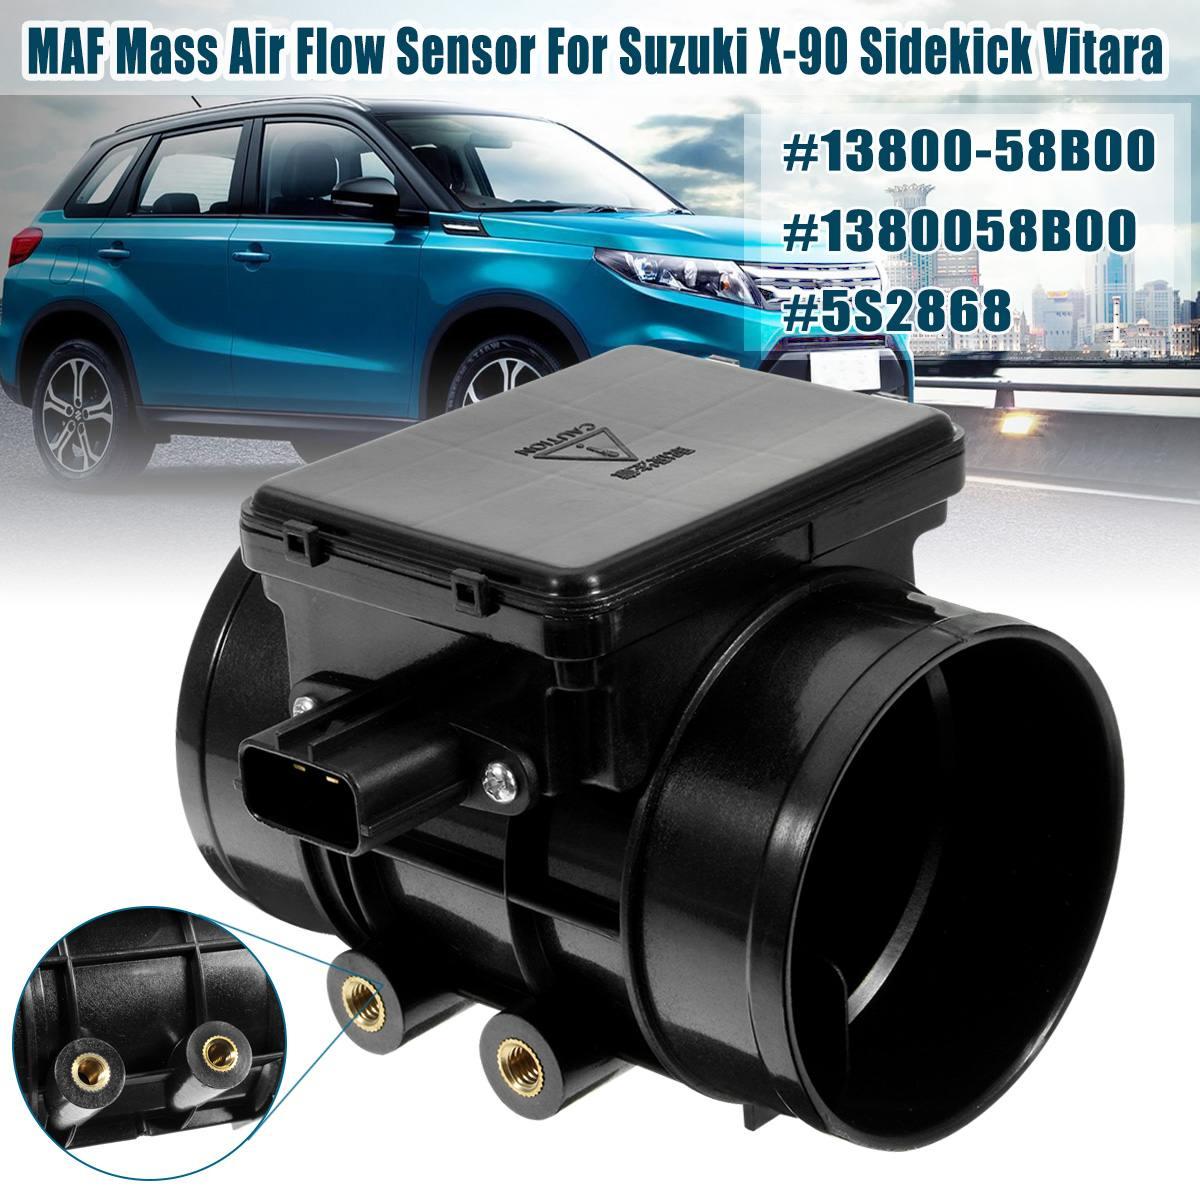 Car MAF MASS AIR FLOW Meter SENSOR FOR Chevrolet Tracker for Mazda Miata Protege for Suzuki Vitara Sidekick 13800-58B00 5S2868